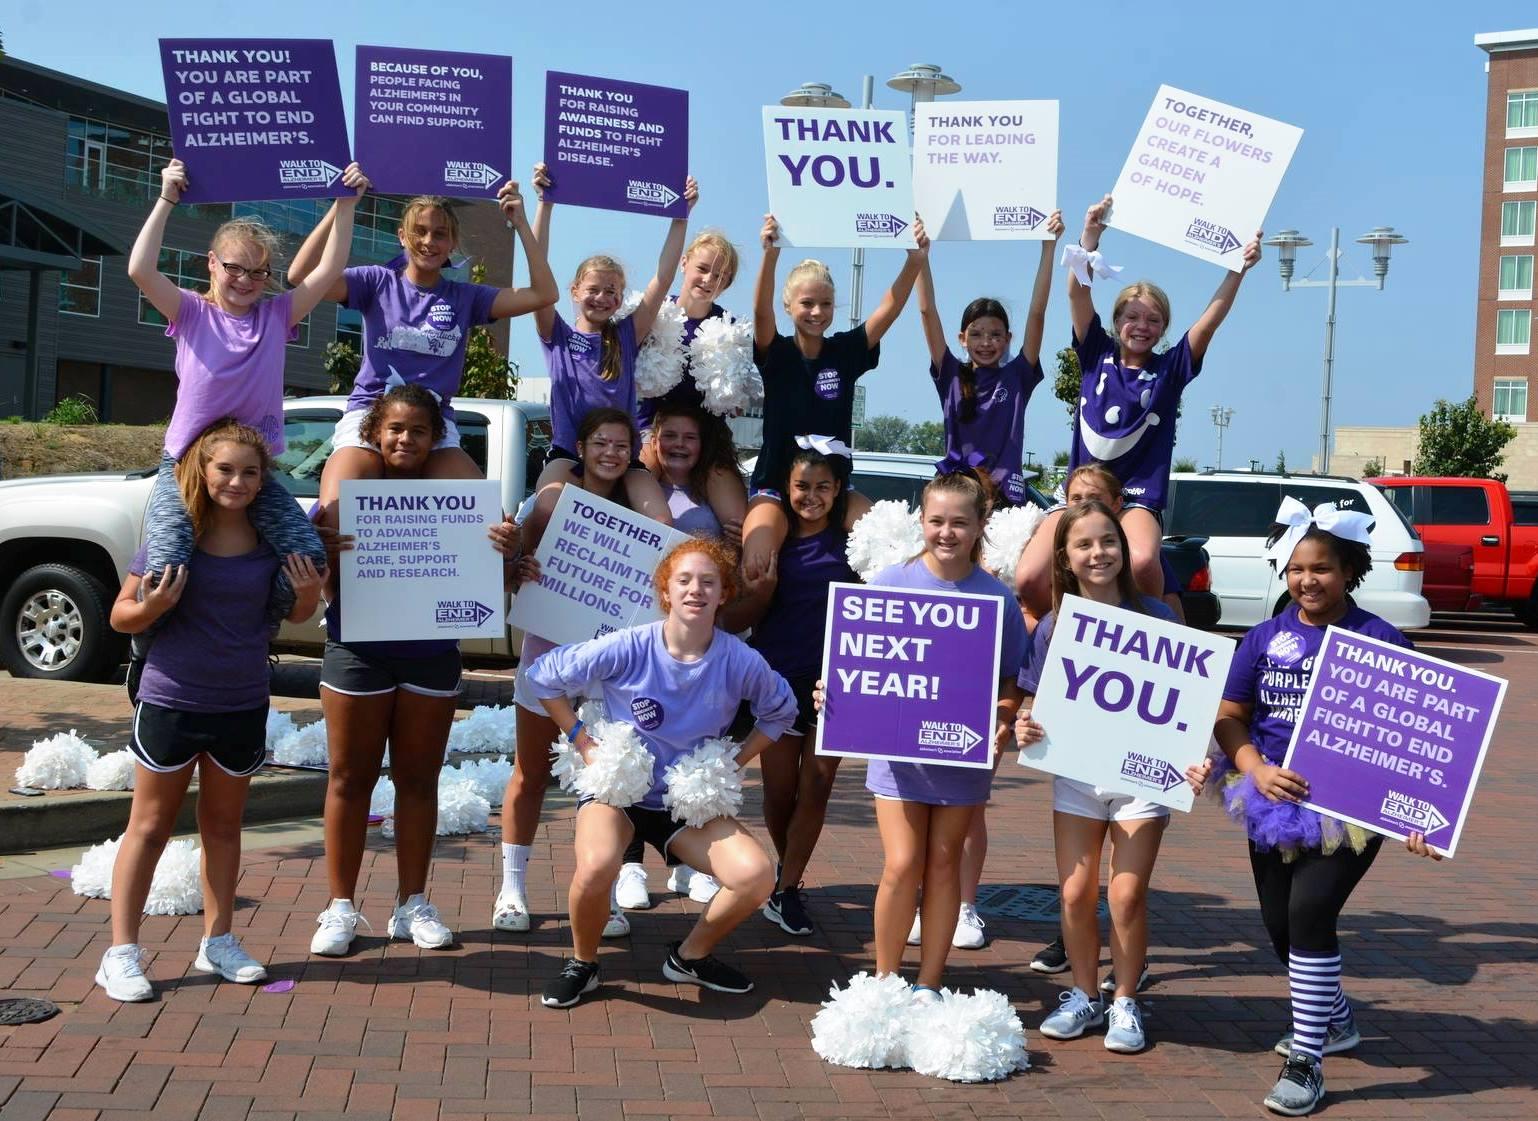 Alzheimer's Association Walk Raises $71,000 In Owensboro